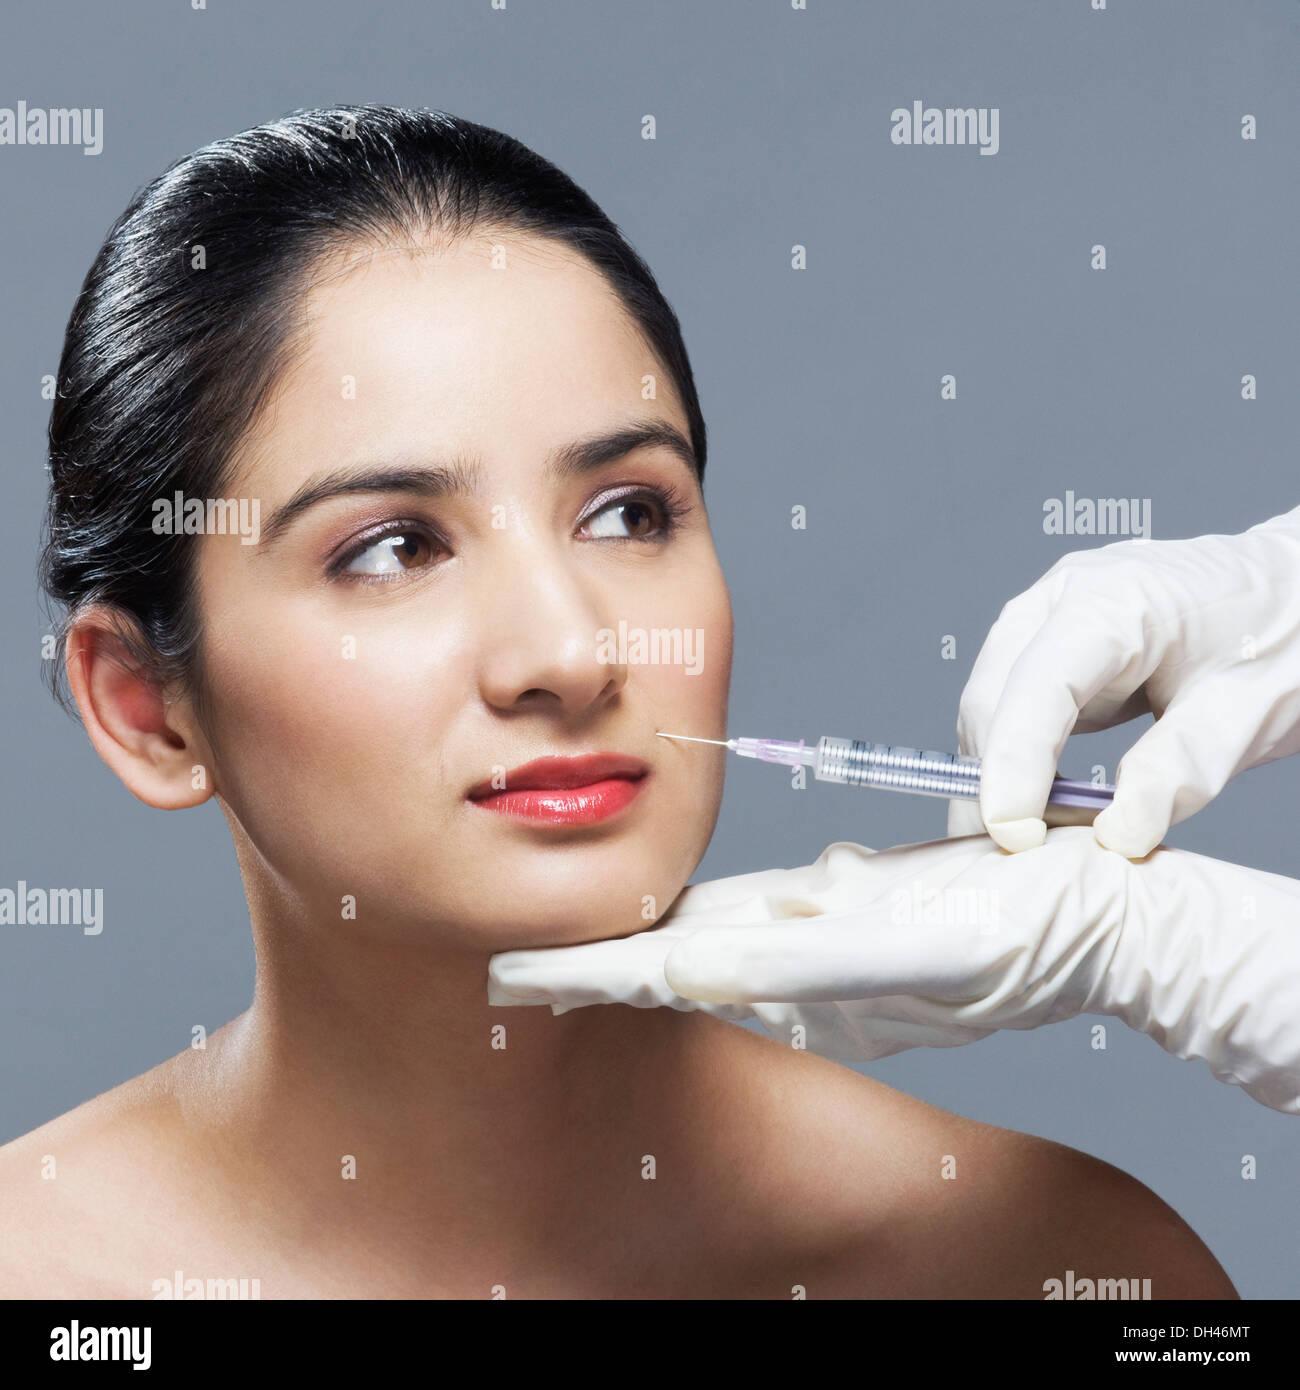 Frau, die eine Botox-Injektion Stockfoto